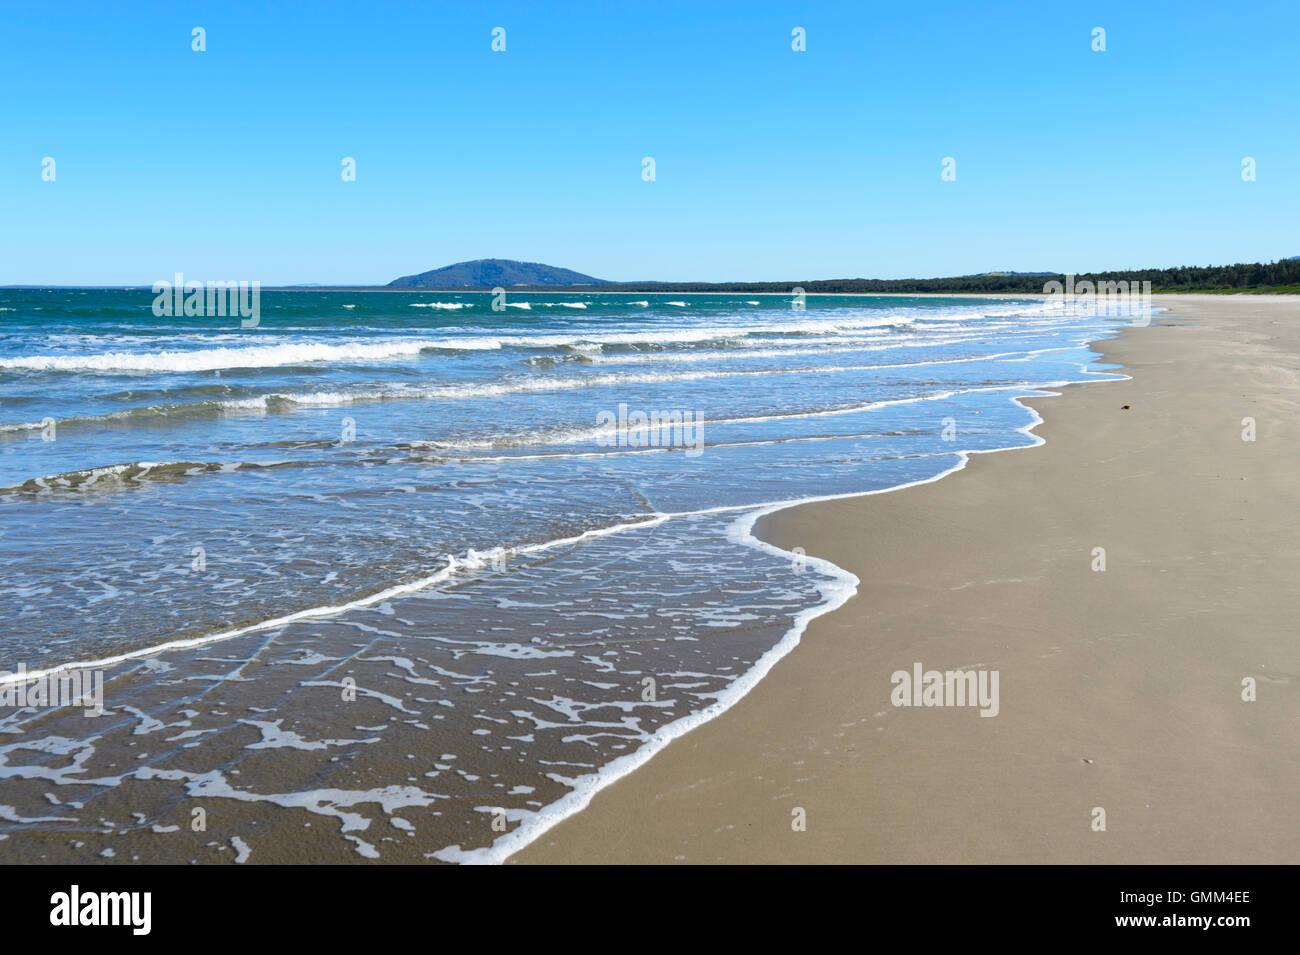 The deserted sandy beach of Seven Mile Beach, Gerroa, Illawarra Coast, New South Wales, Australia - Stock Image